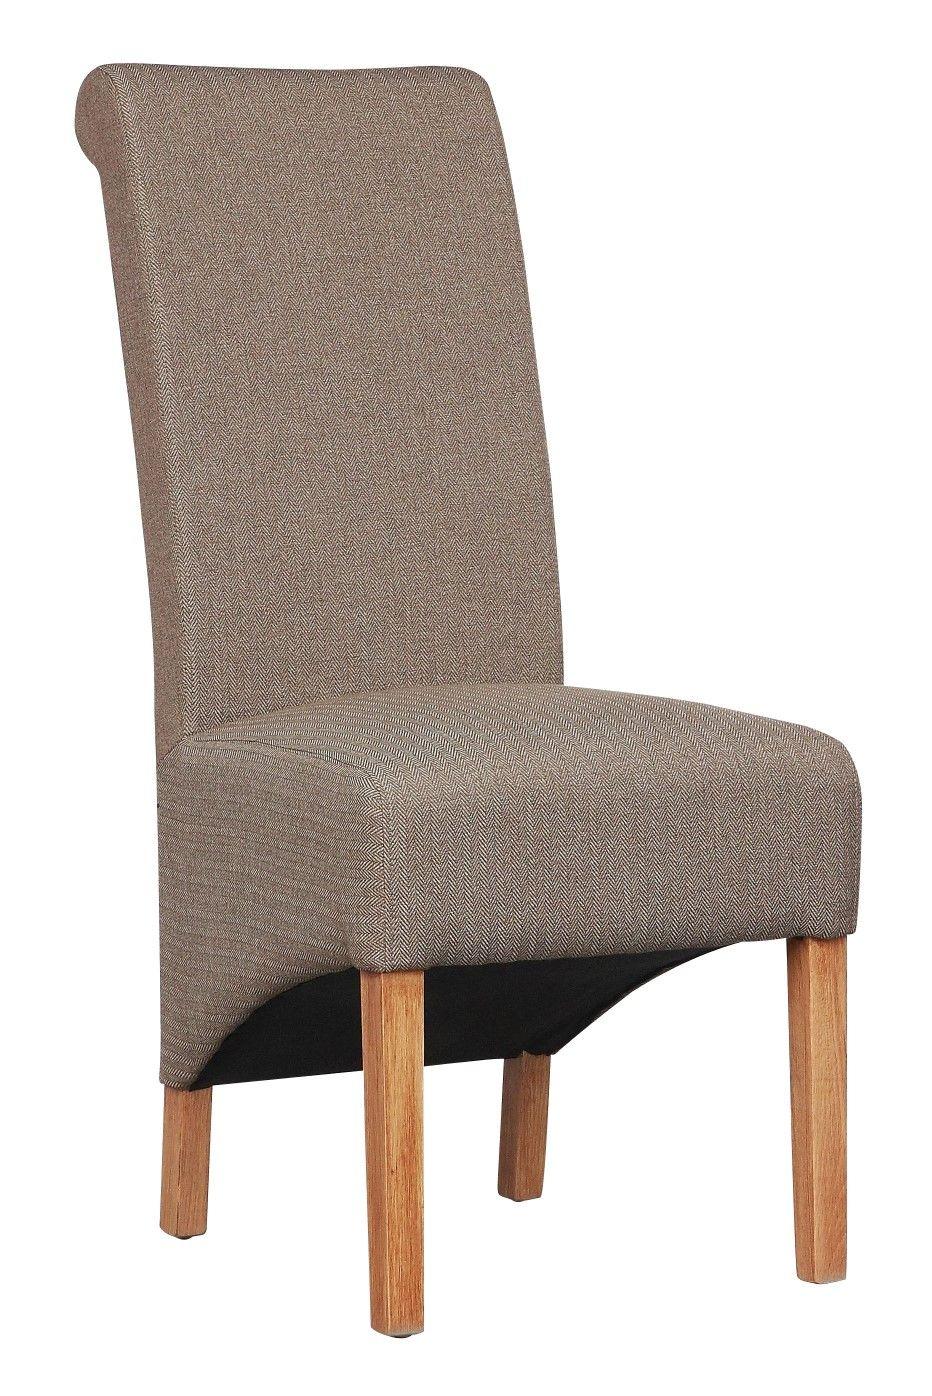 Dalia Herringbone Plain Fabric Dining Chairs